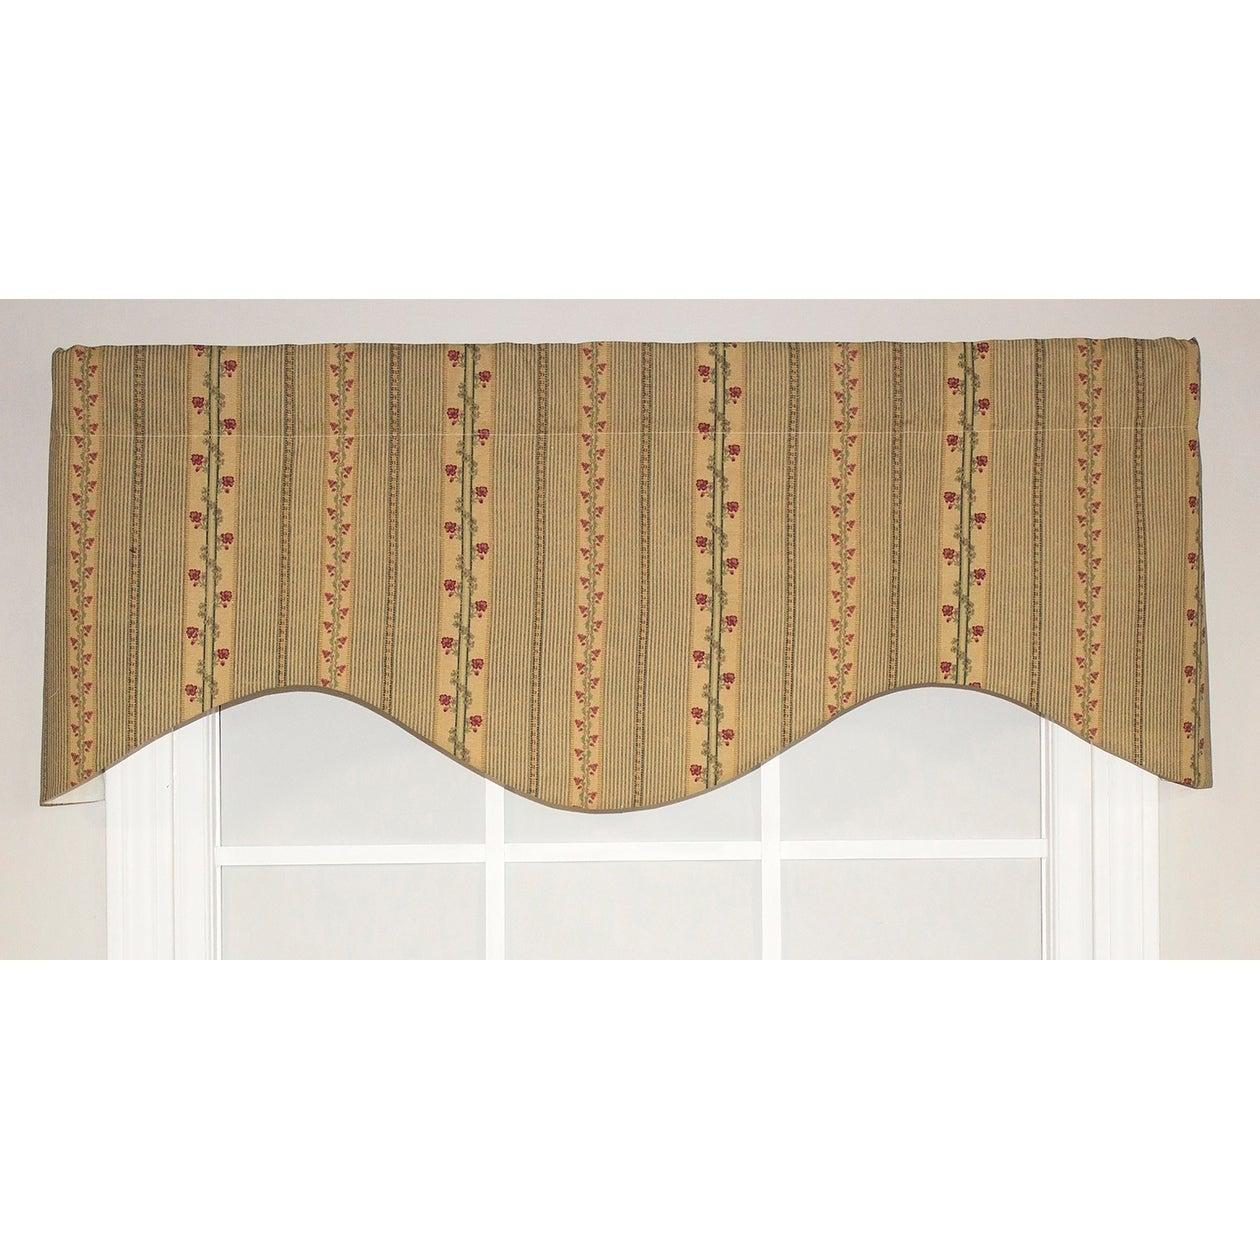 cornice window valance leather window rlfhomeflemingstripecornicewindowvalance rlf home fleming stripe cornice window valance ebay